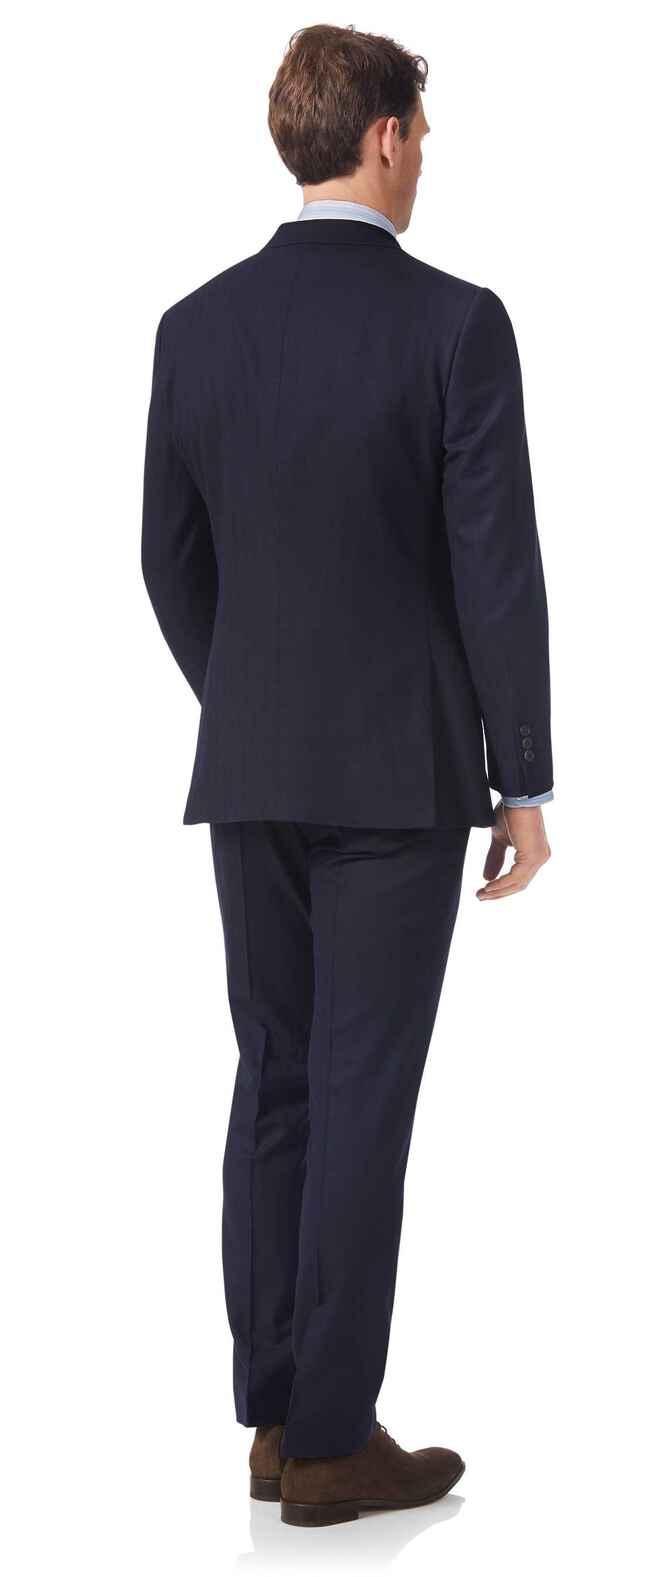 Navy slim fit British luxury suit